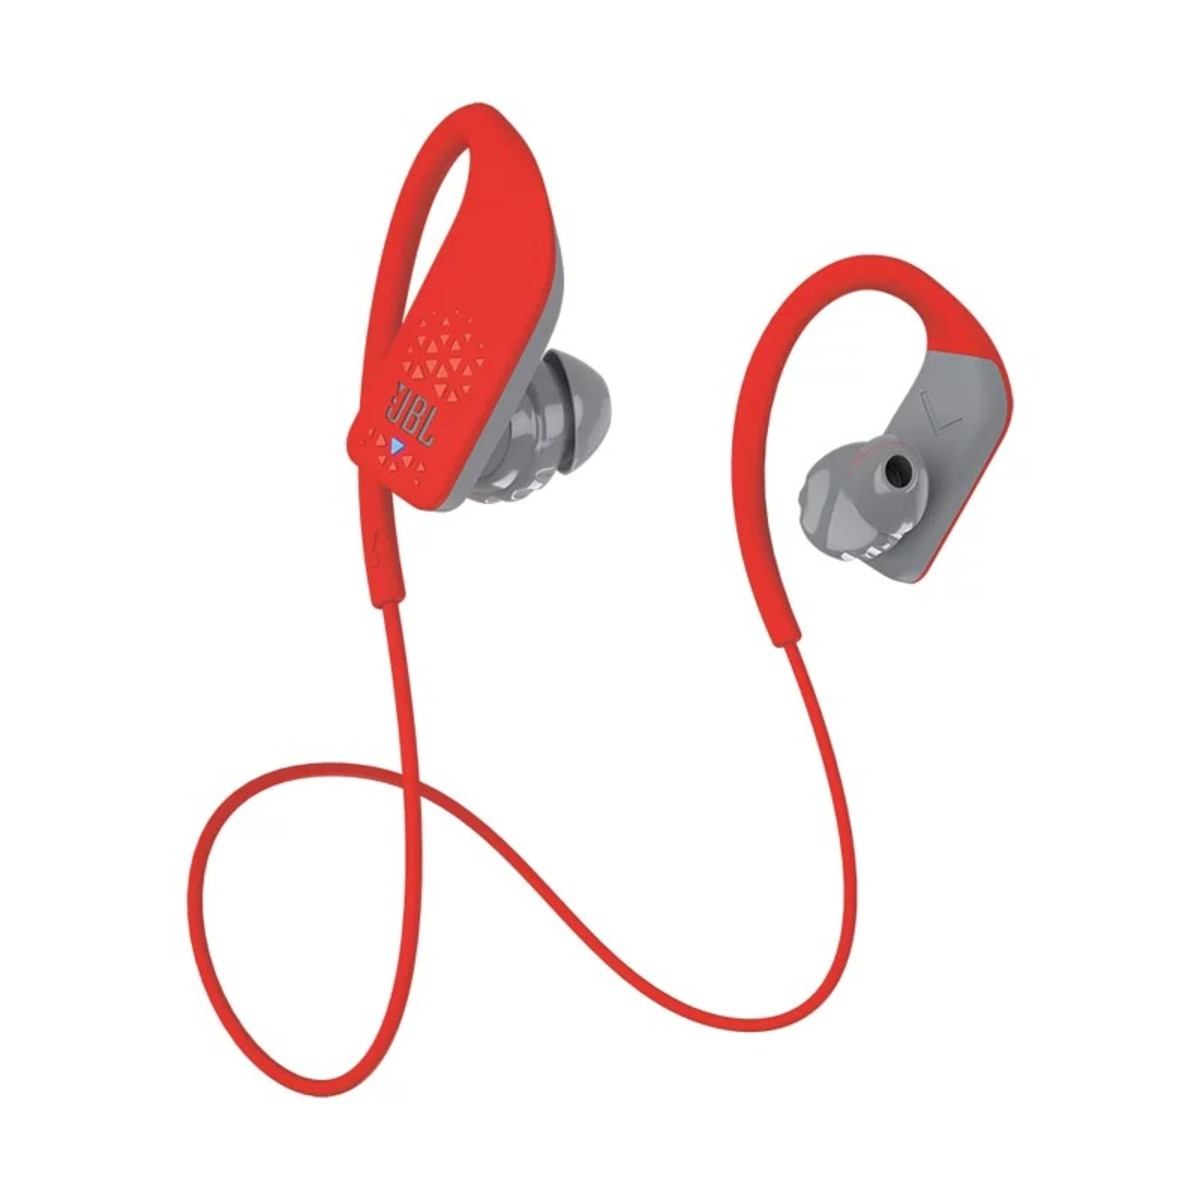 JBL Grip 500 無線入耳式運動耳機 / 紅色 (香港行貨)